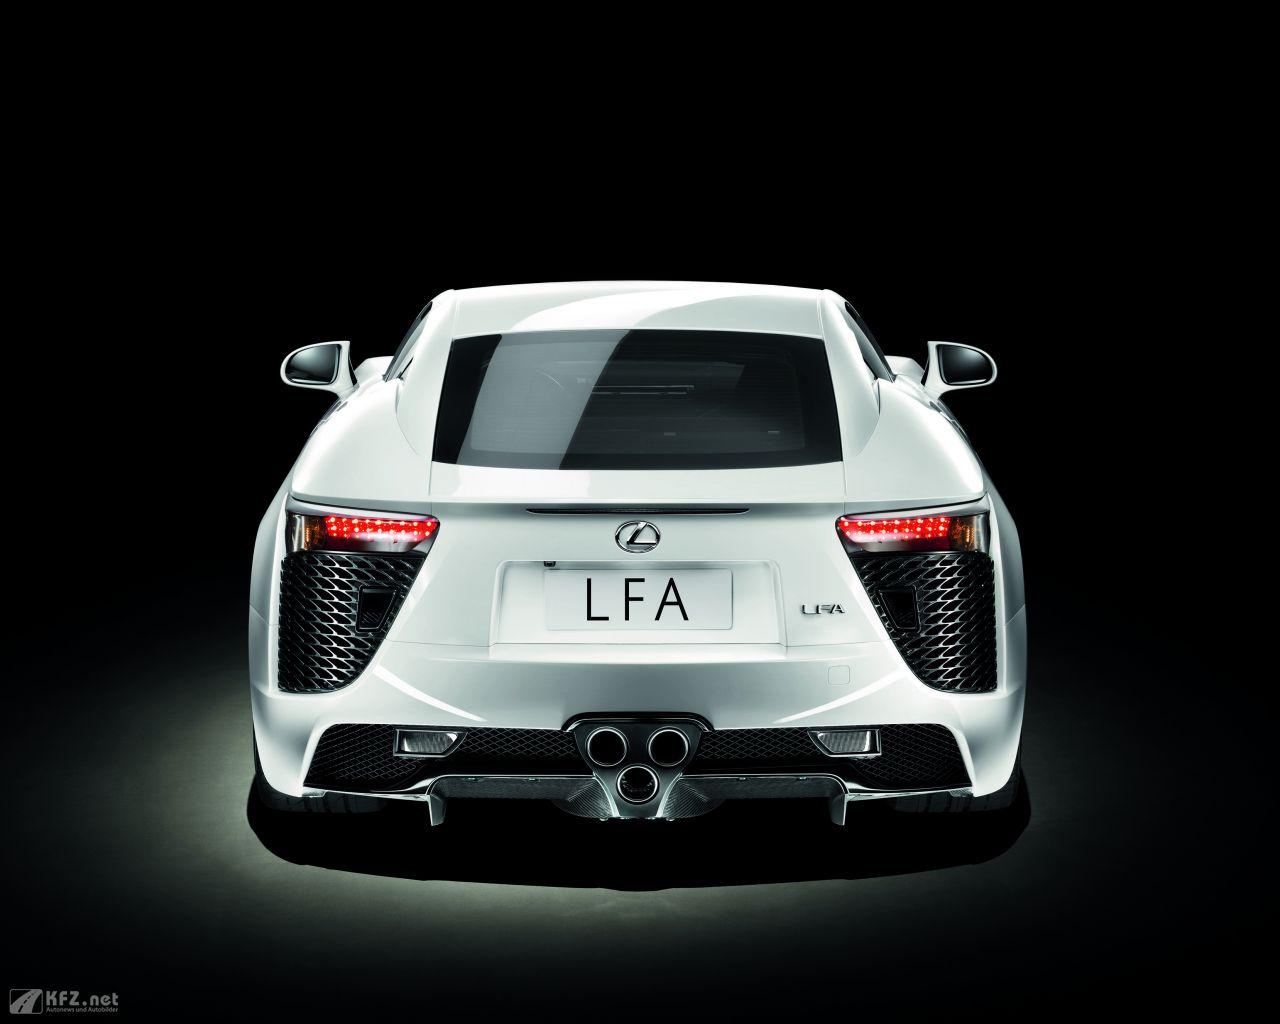 lexus-lfa-1280x1024-4